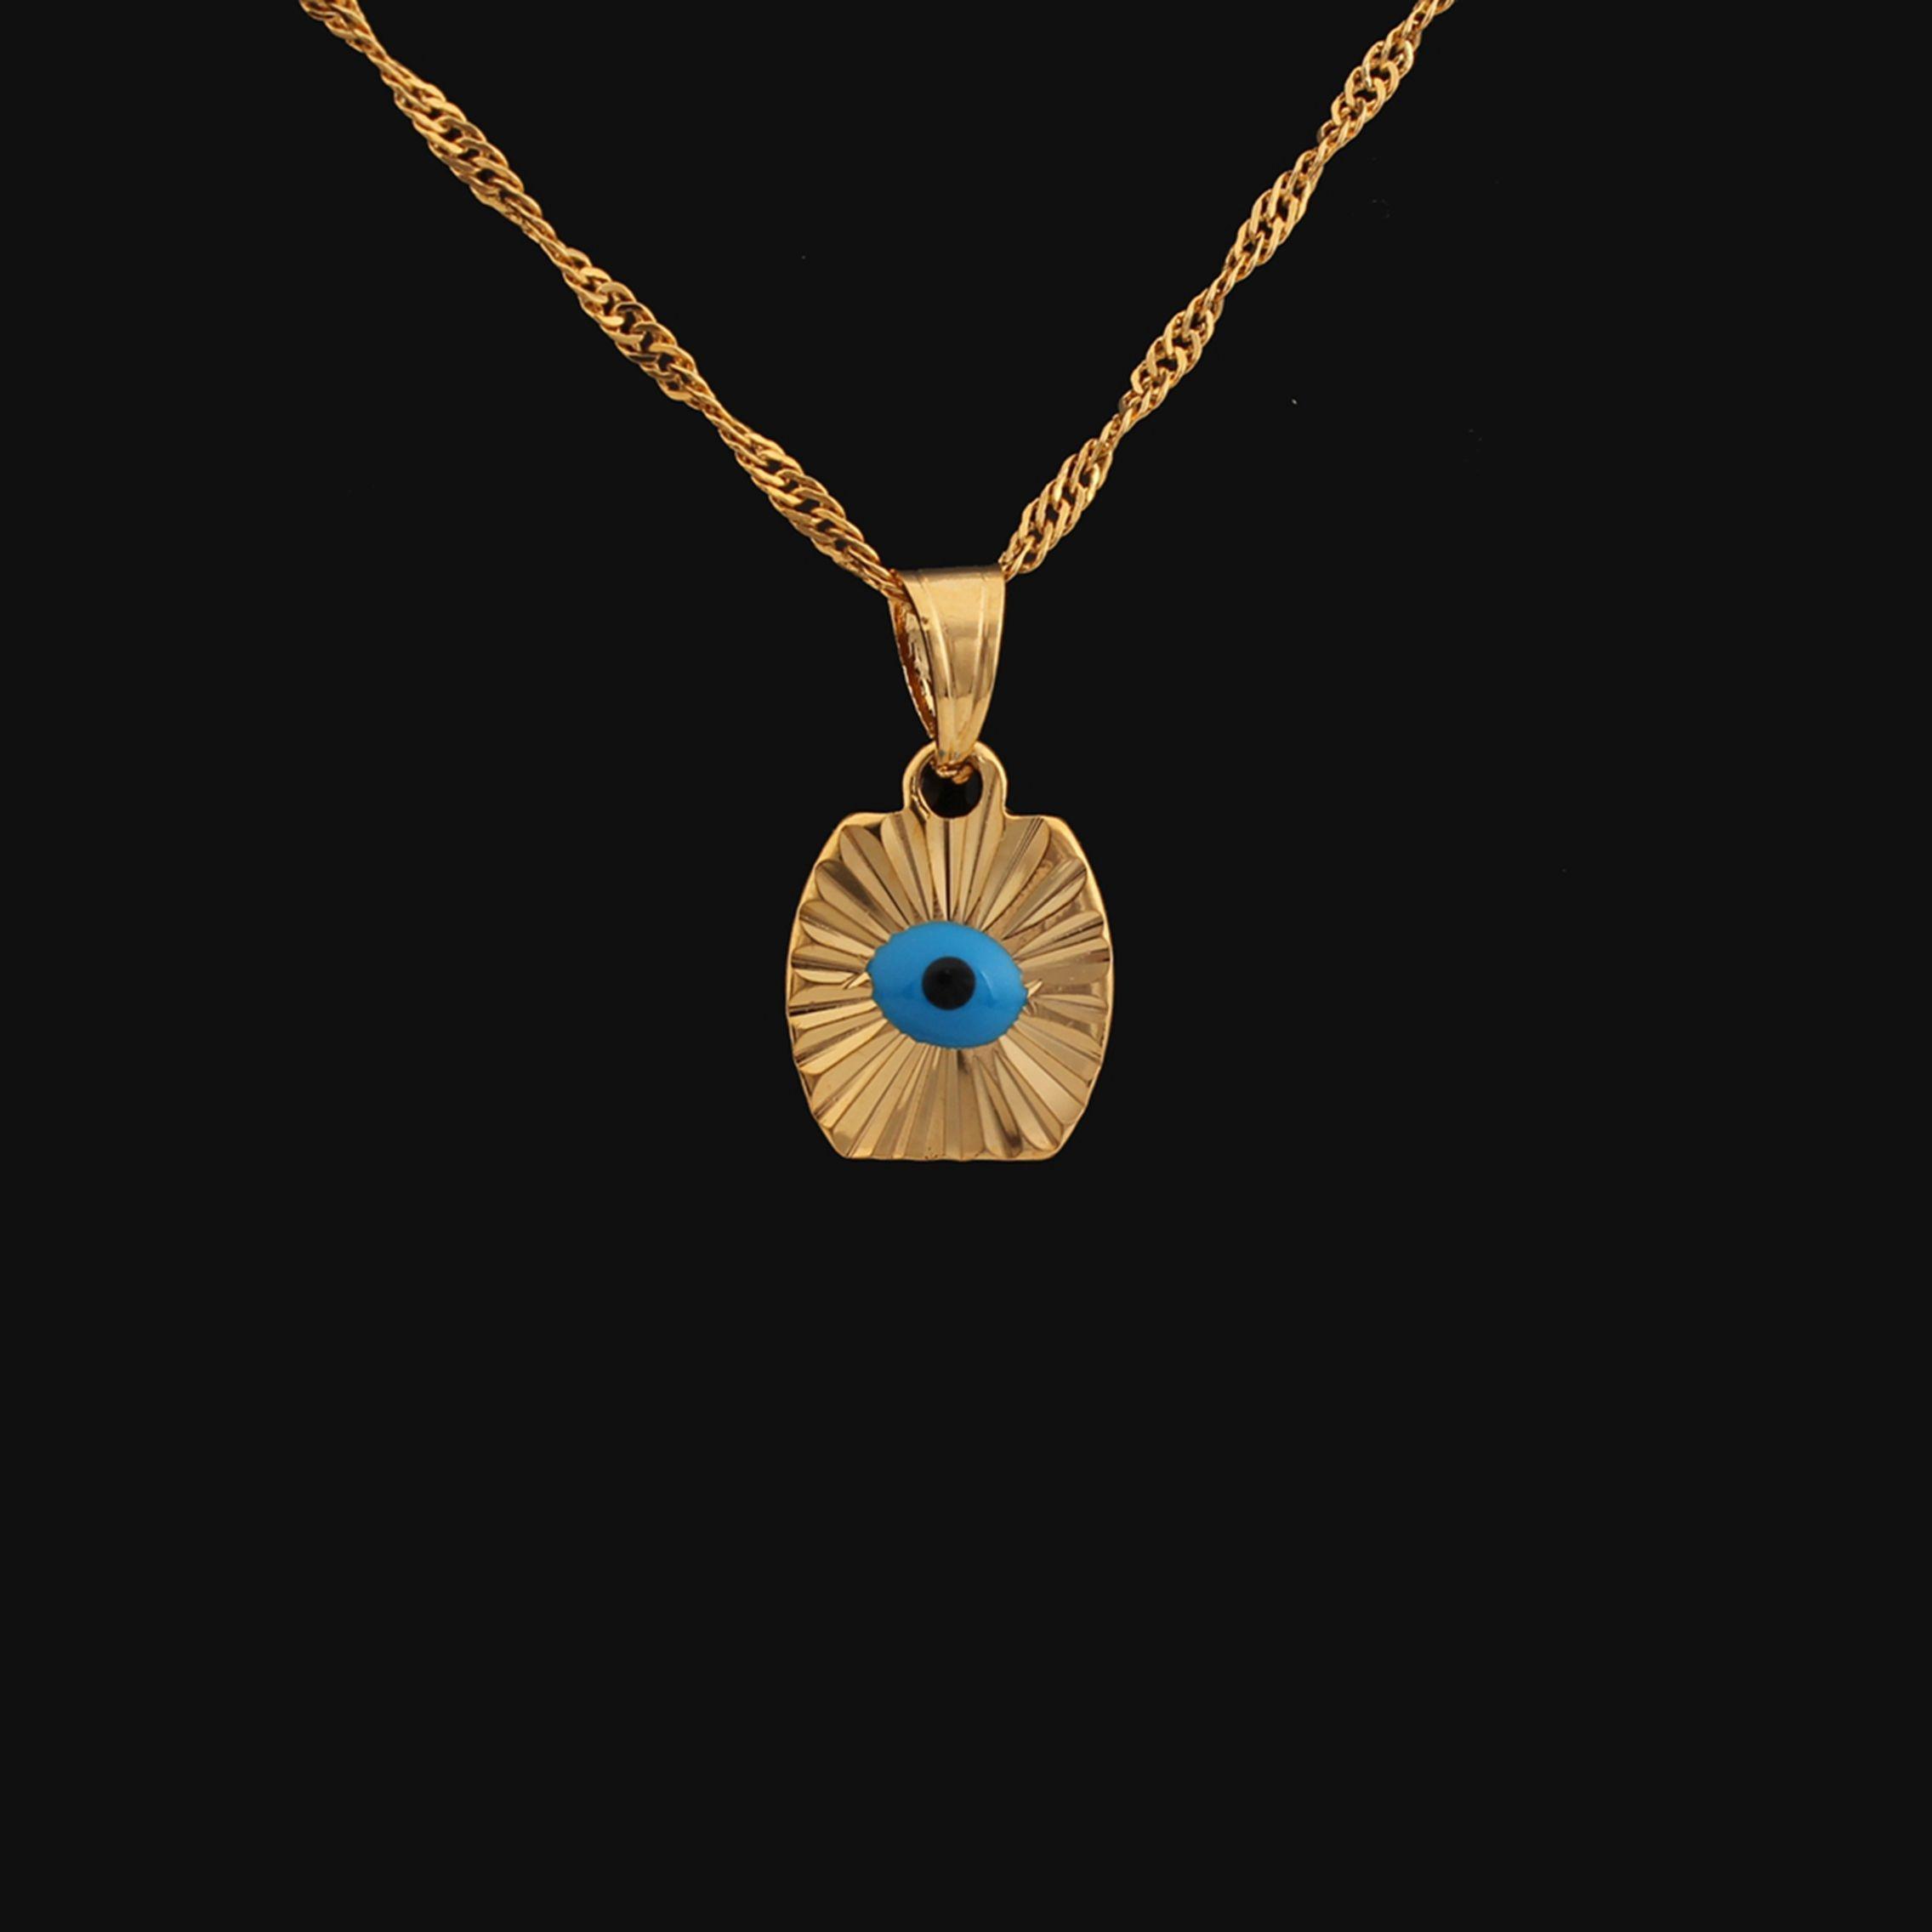 Wholesale 2015 New Vintage18k Gold Plated Blue Turkey Evil Eye